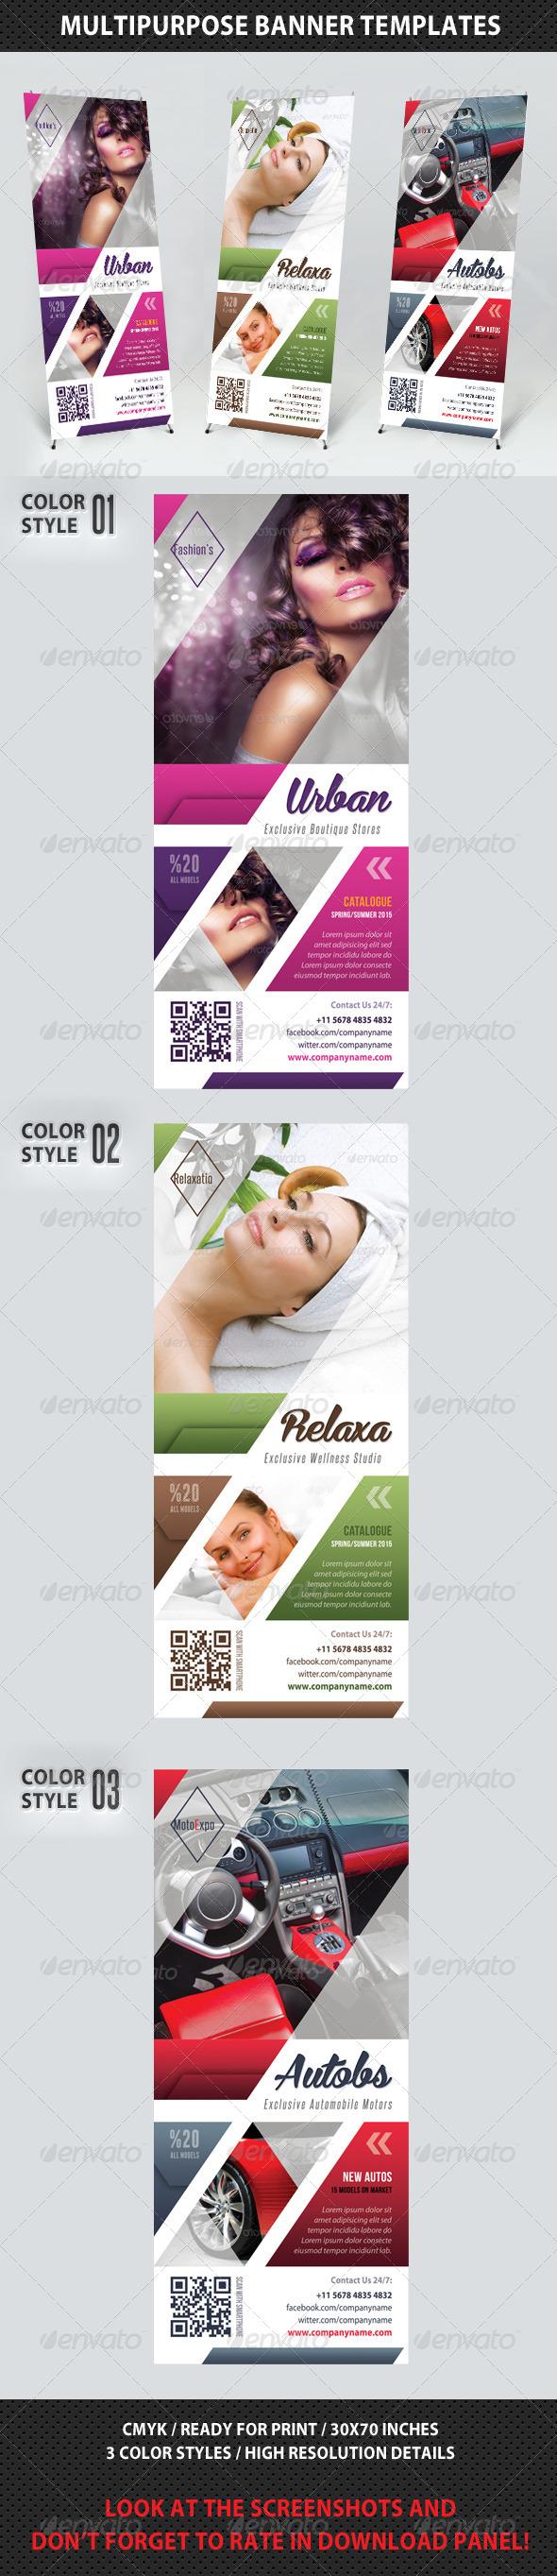 GraphicRiver Multipurpose Banner Template V02 7605248